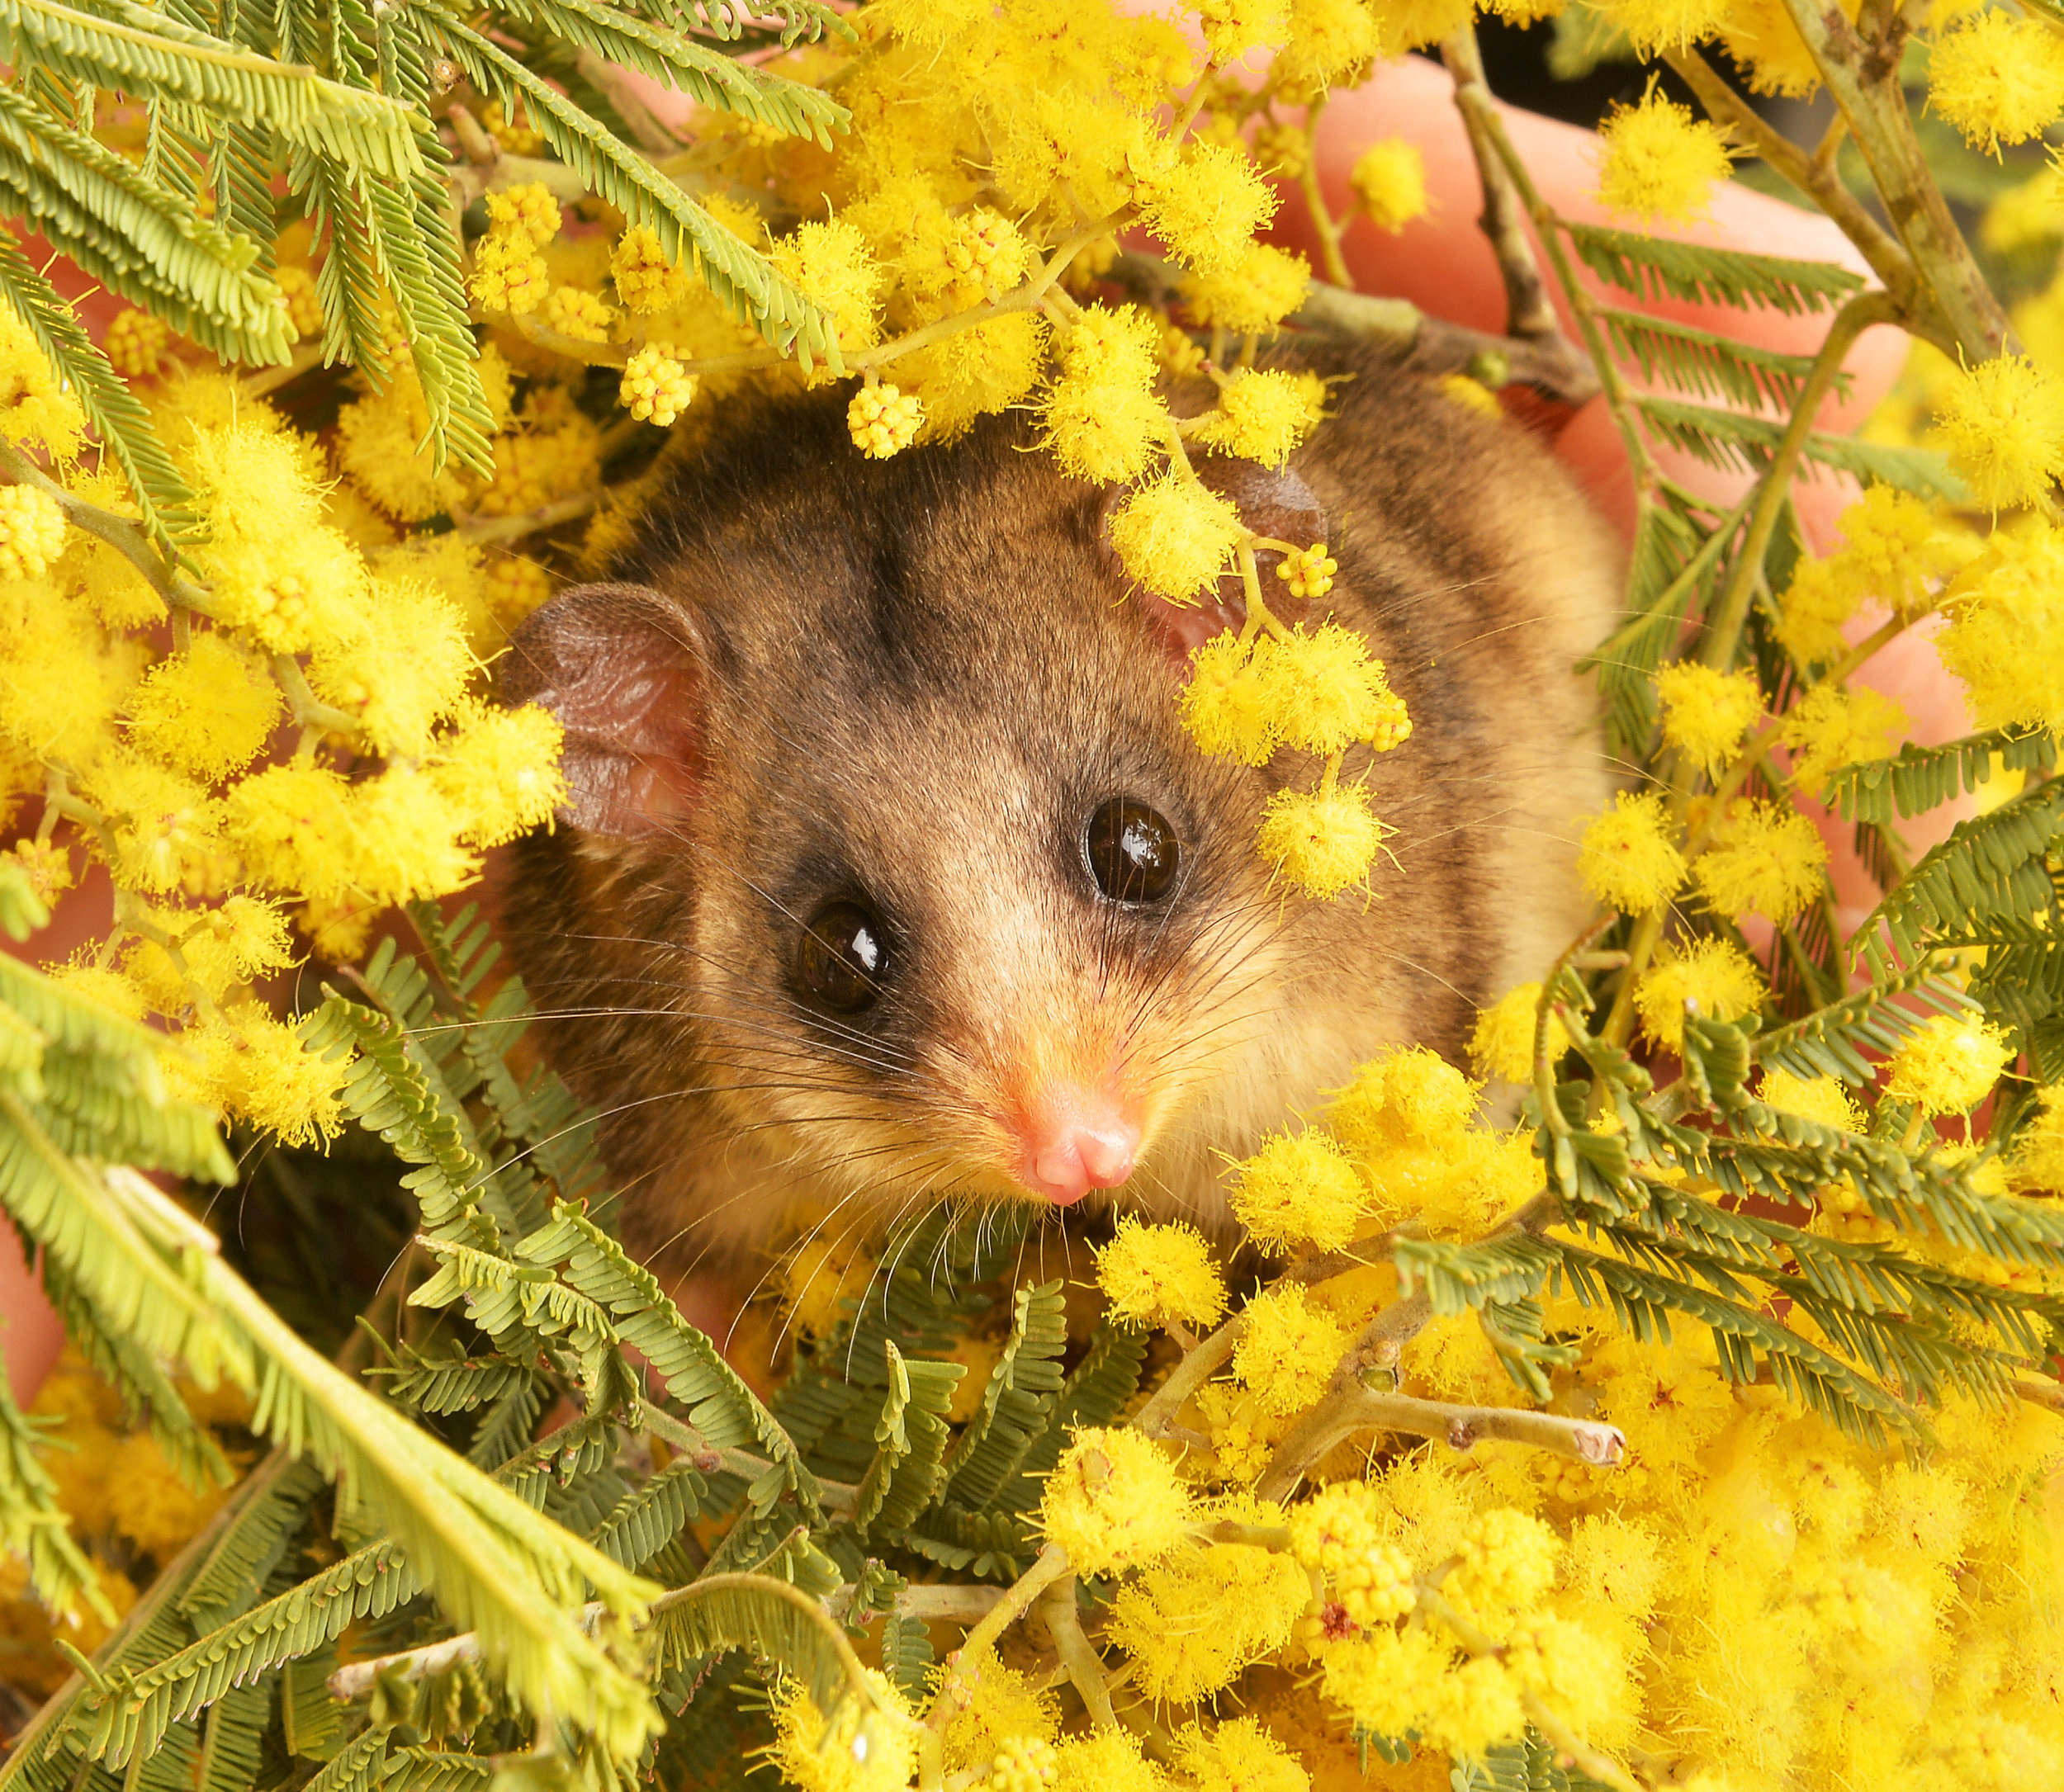 CHP_Export_123517895_Healesville Animals Frankie the Mountain Pygmy Possum enjoys play time enri.jpg